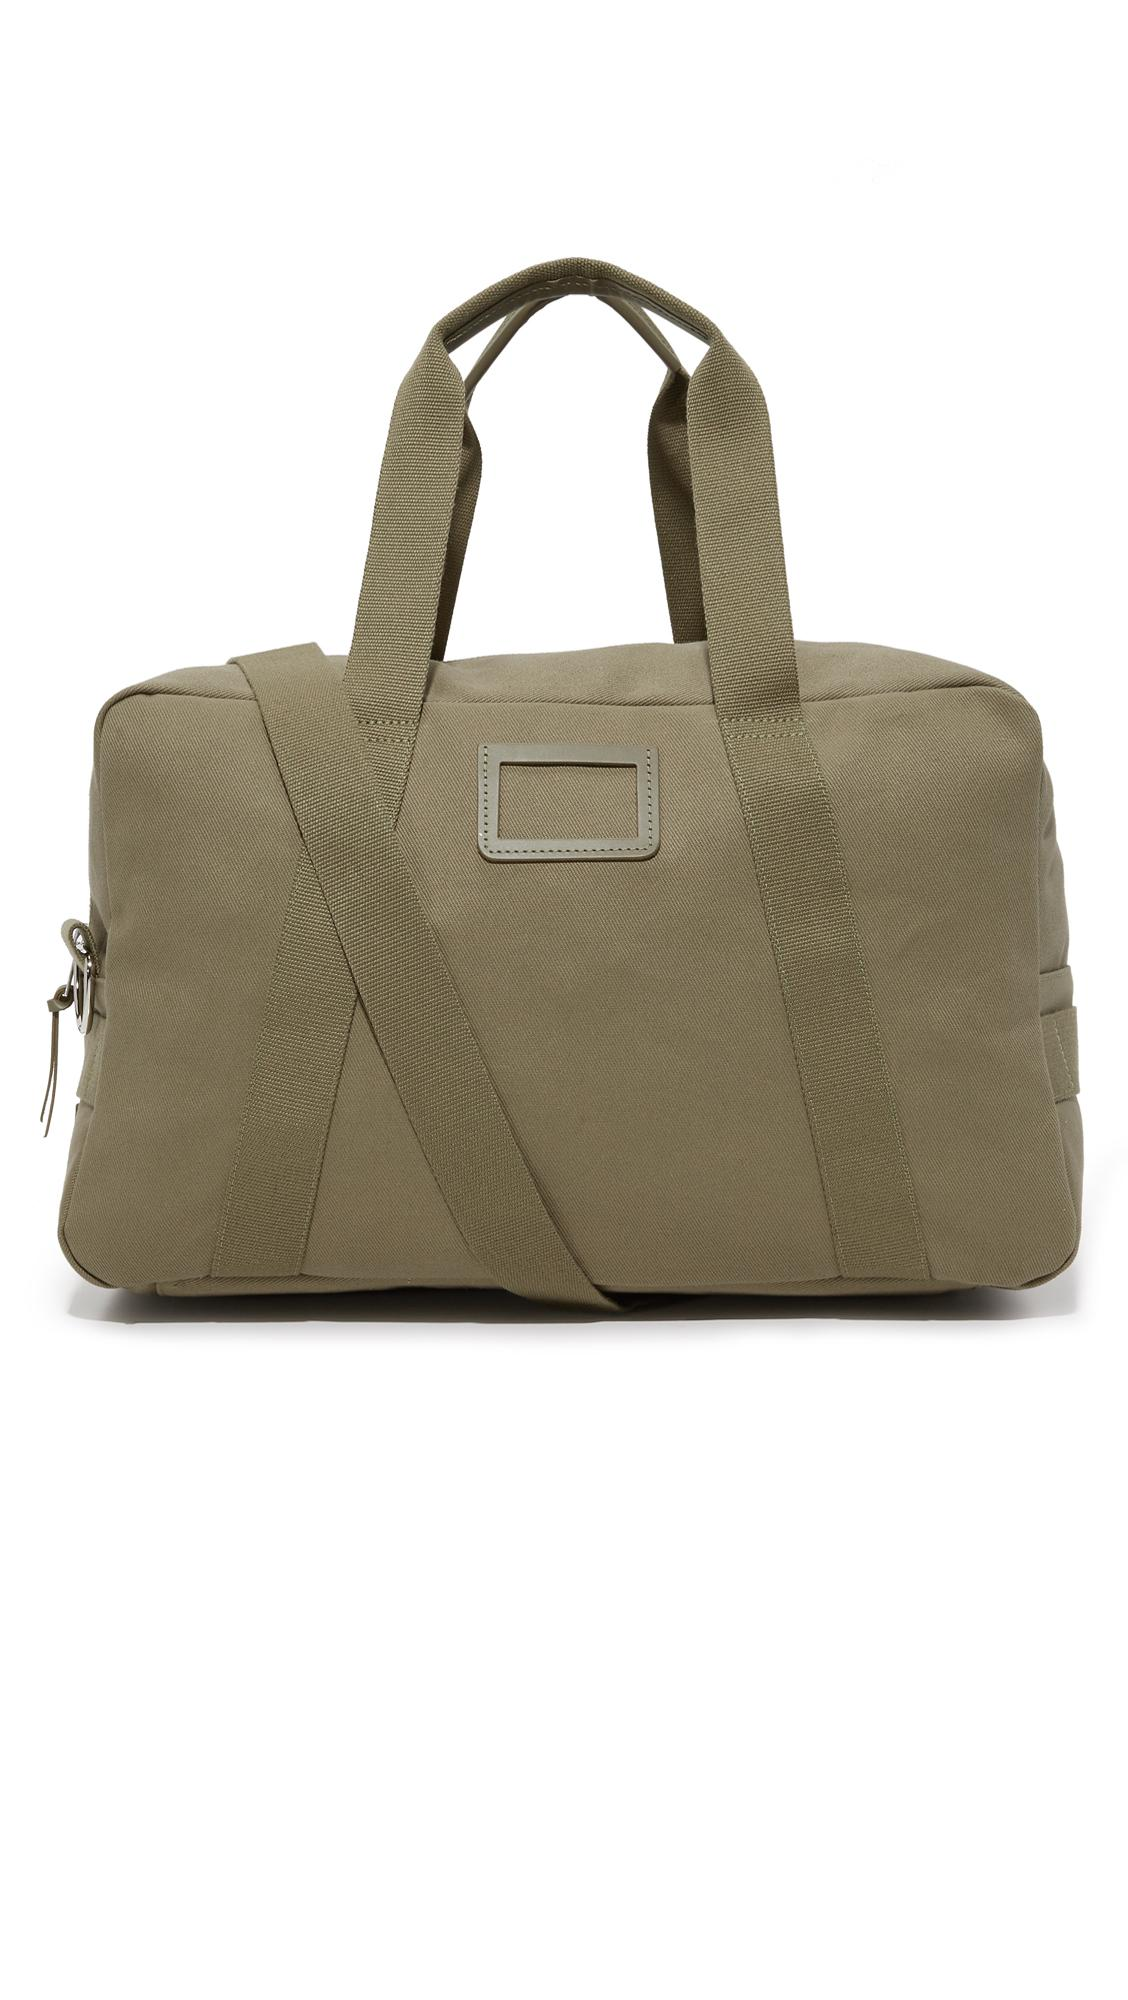 801ef7012f06 Cambridge Satchel Company Canvas Weekend Bag for Men - Lyst